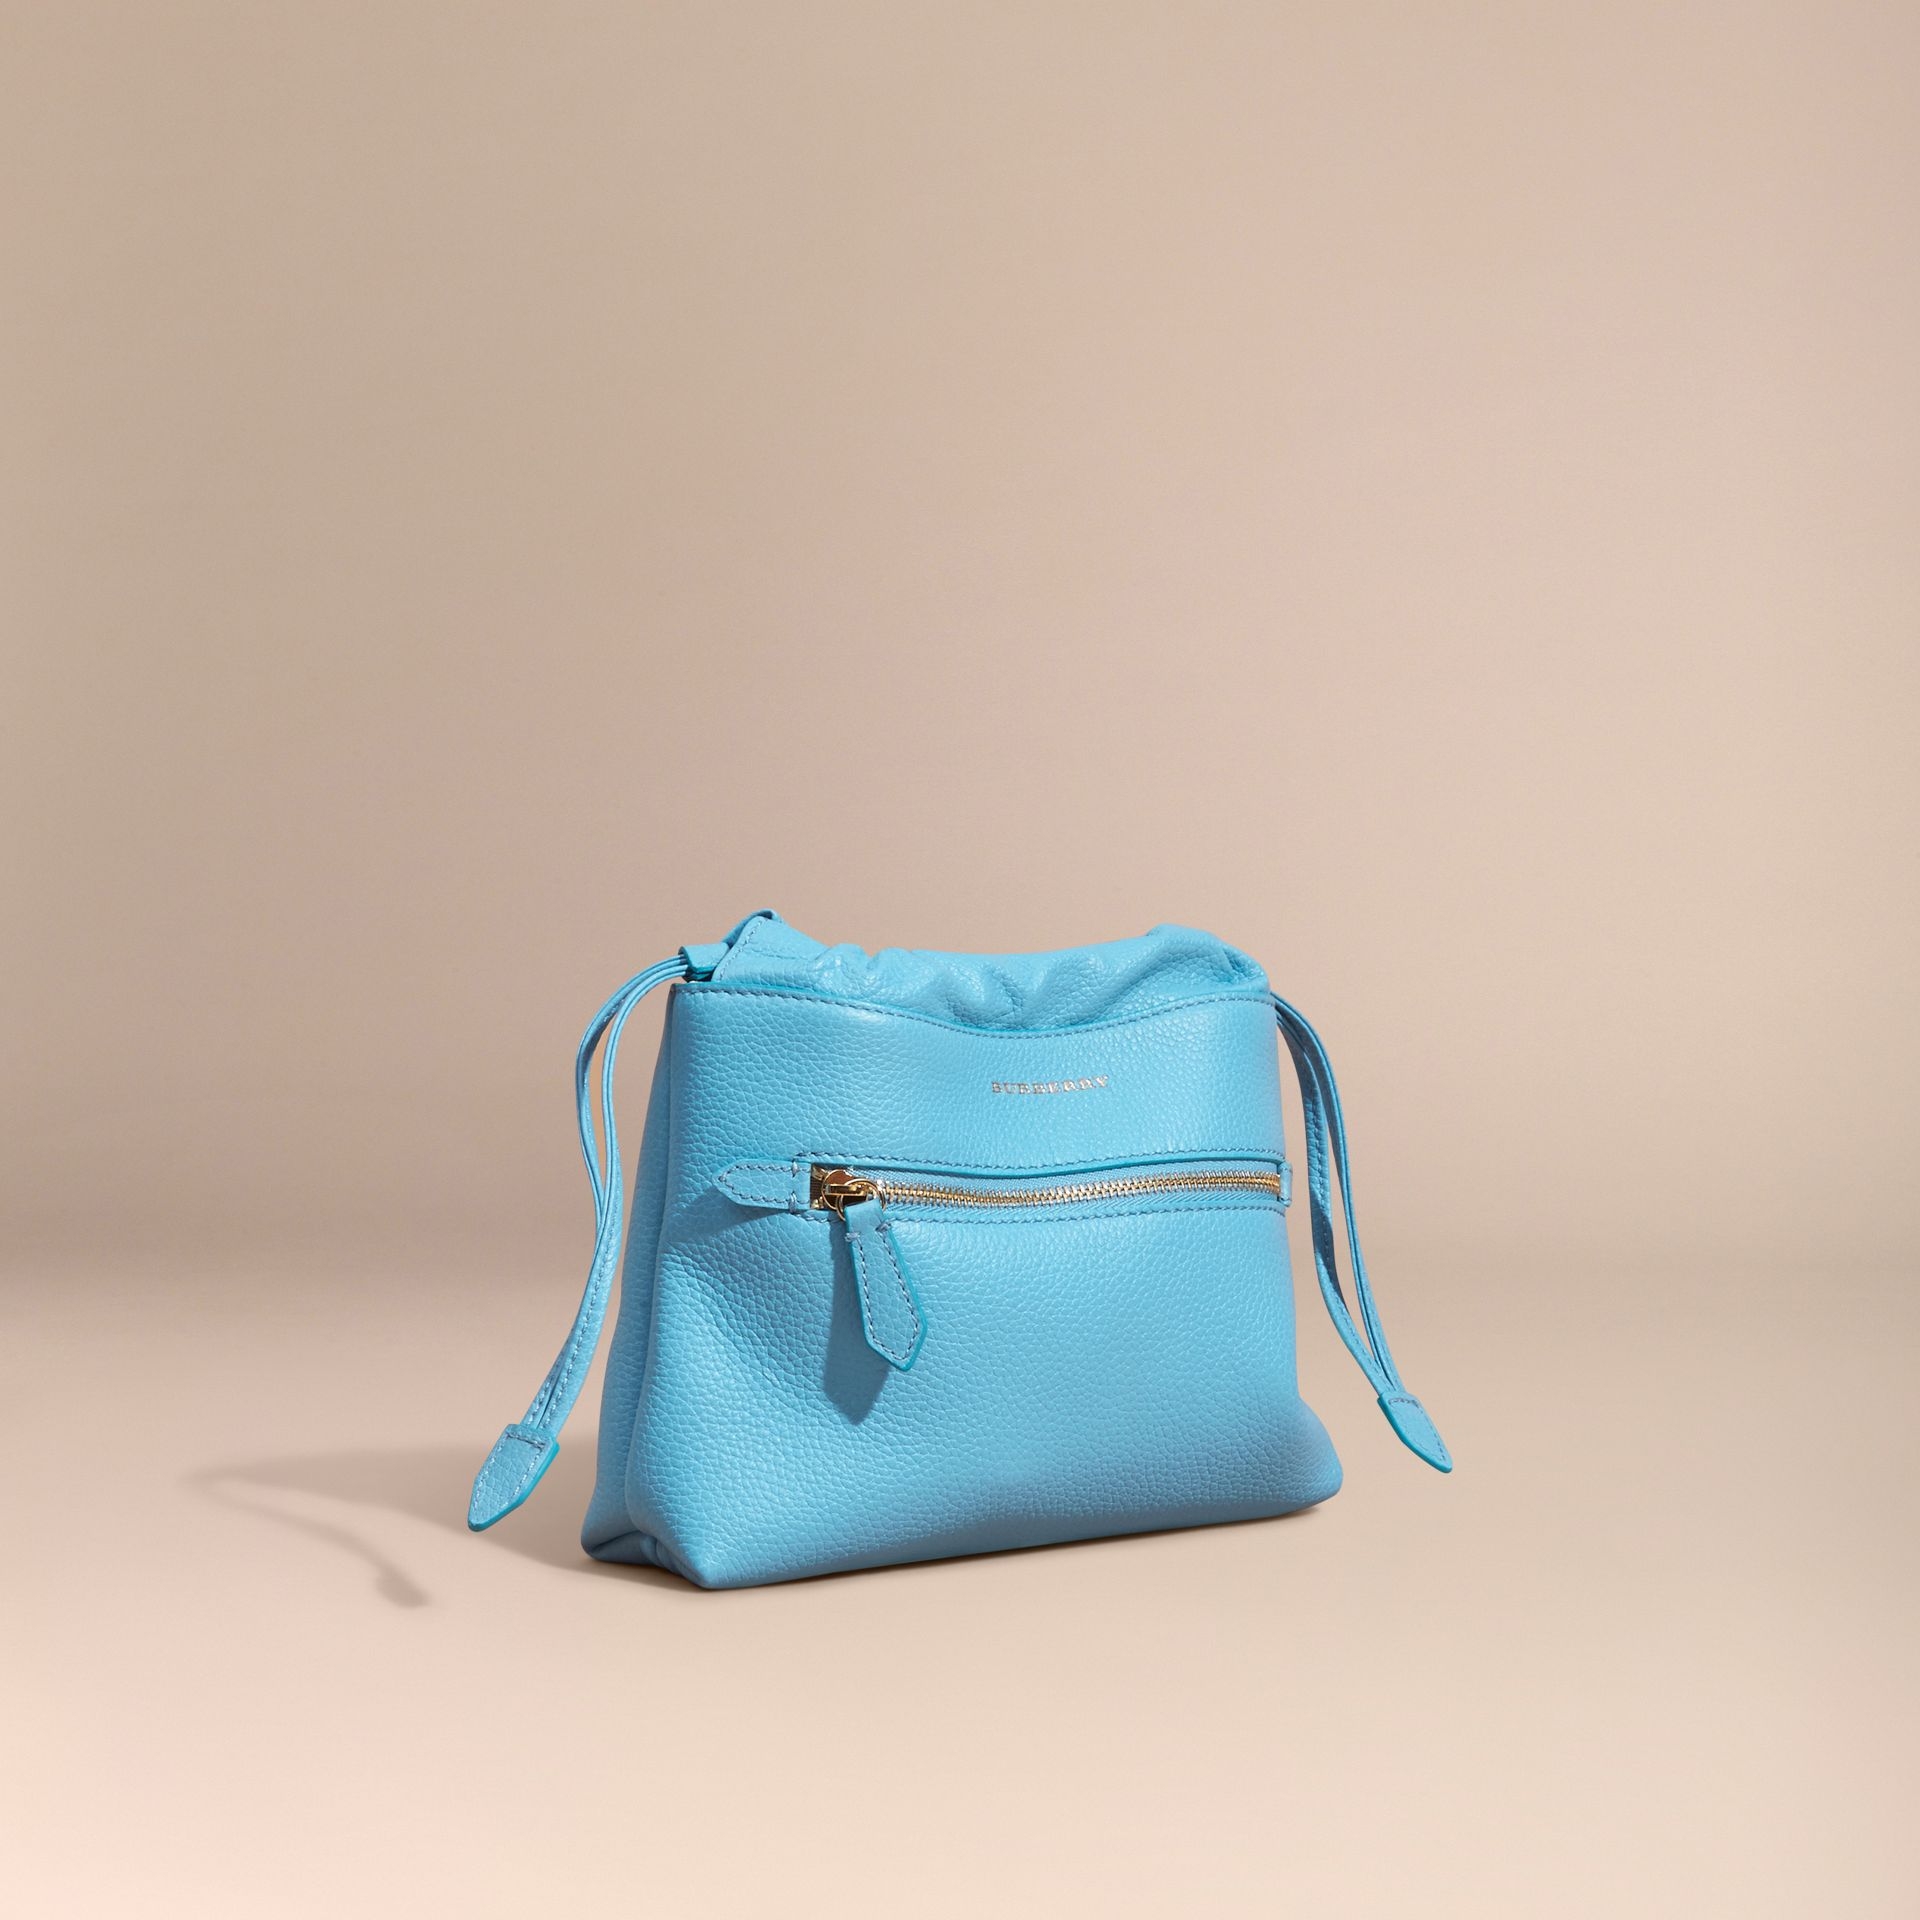 Blu minerale intenso The Mini Crush in pelle a grana Blu Minerale Intenso - immagine della galleria 1